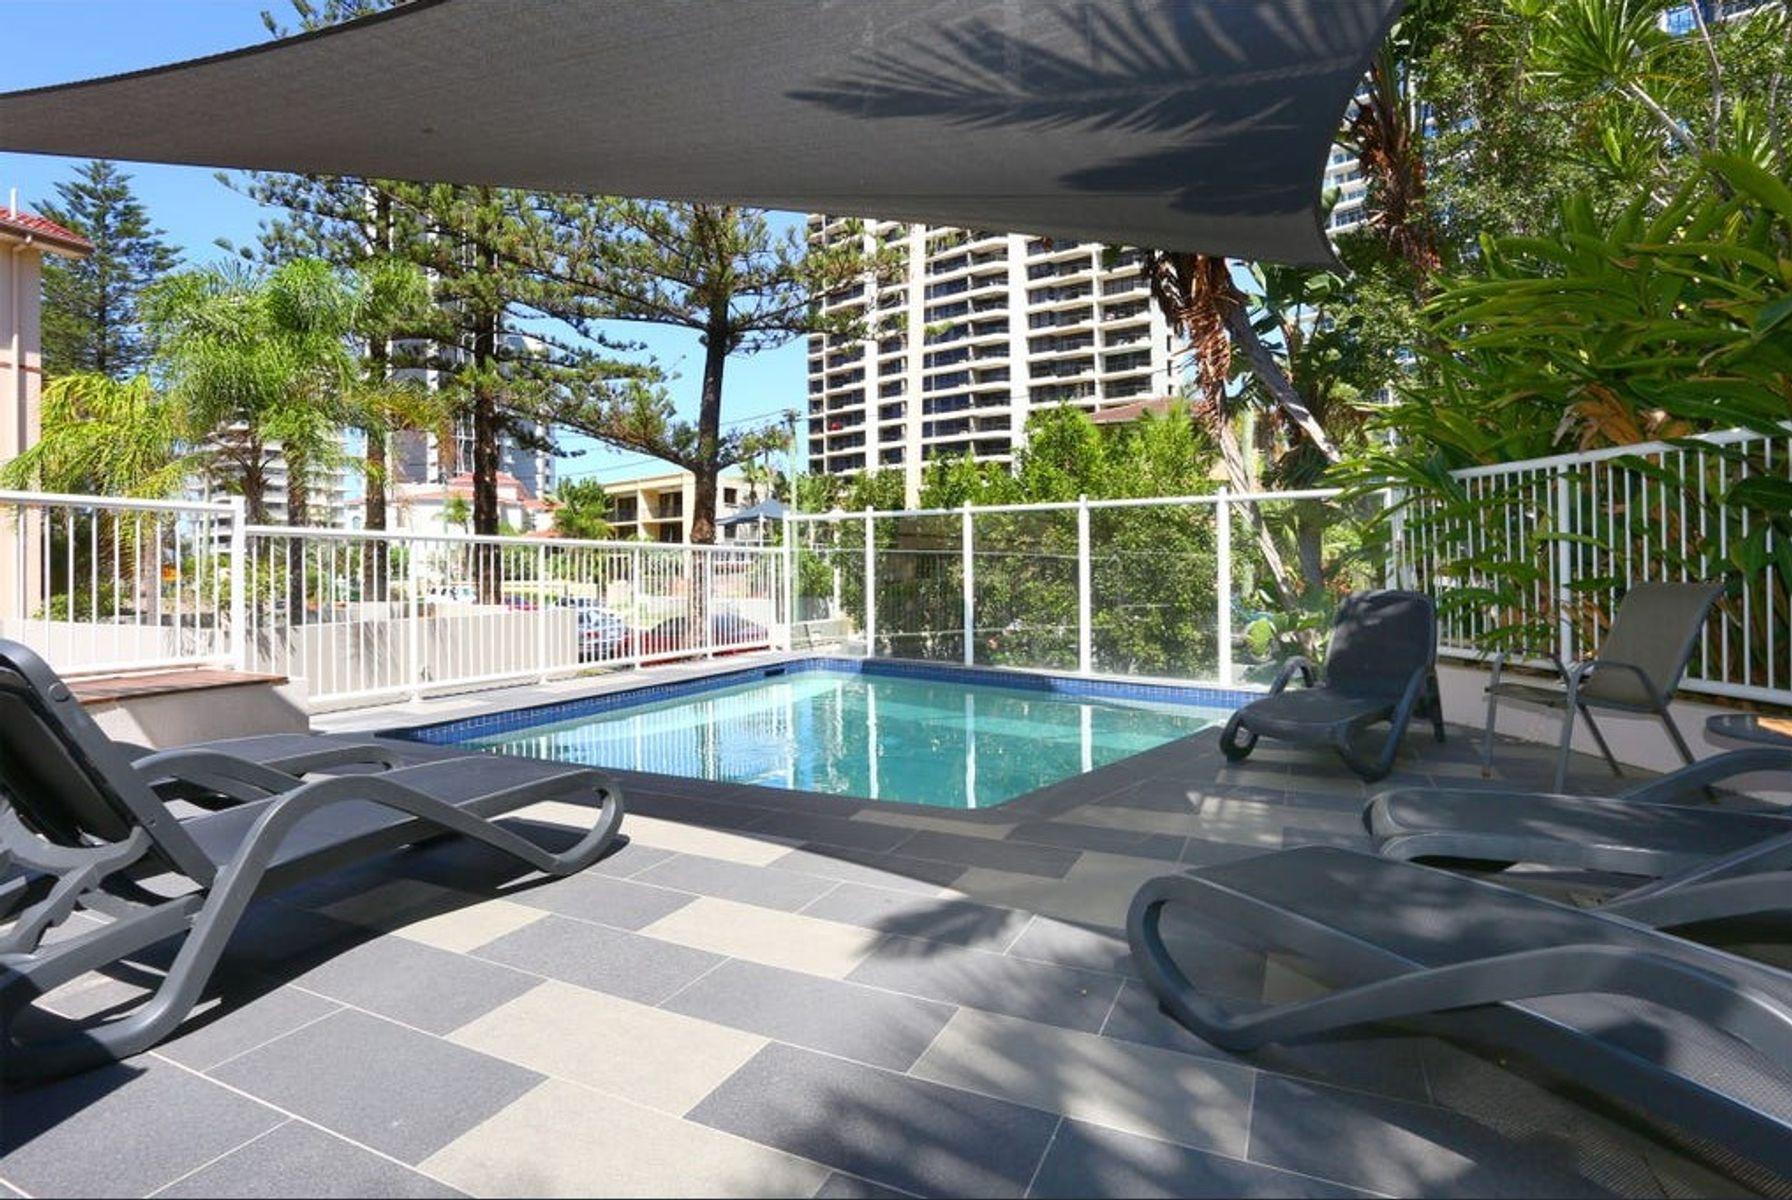 33/21 Markwell Avenue, Surfers Paradise, QLD 4217